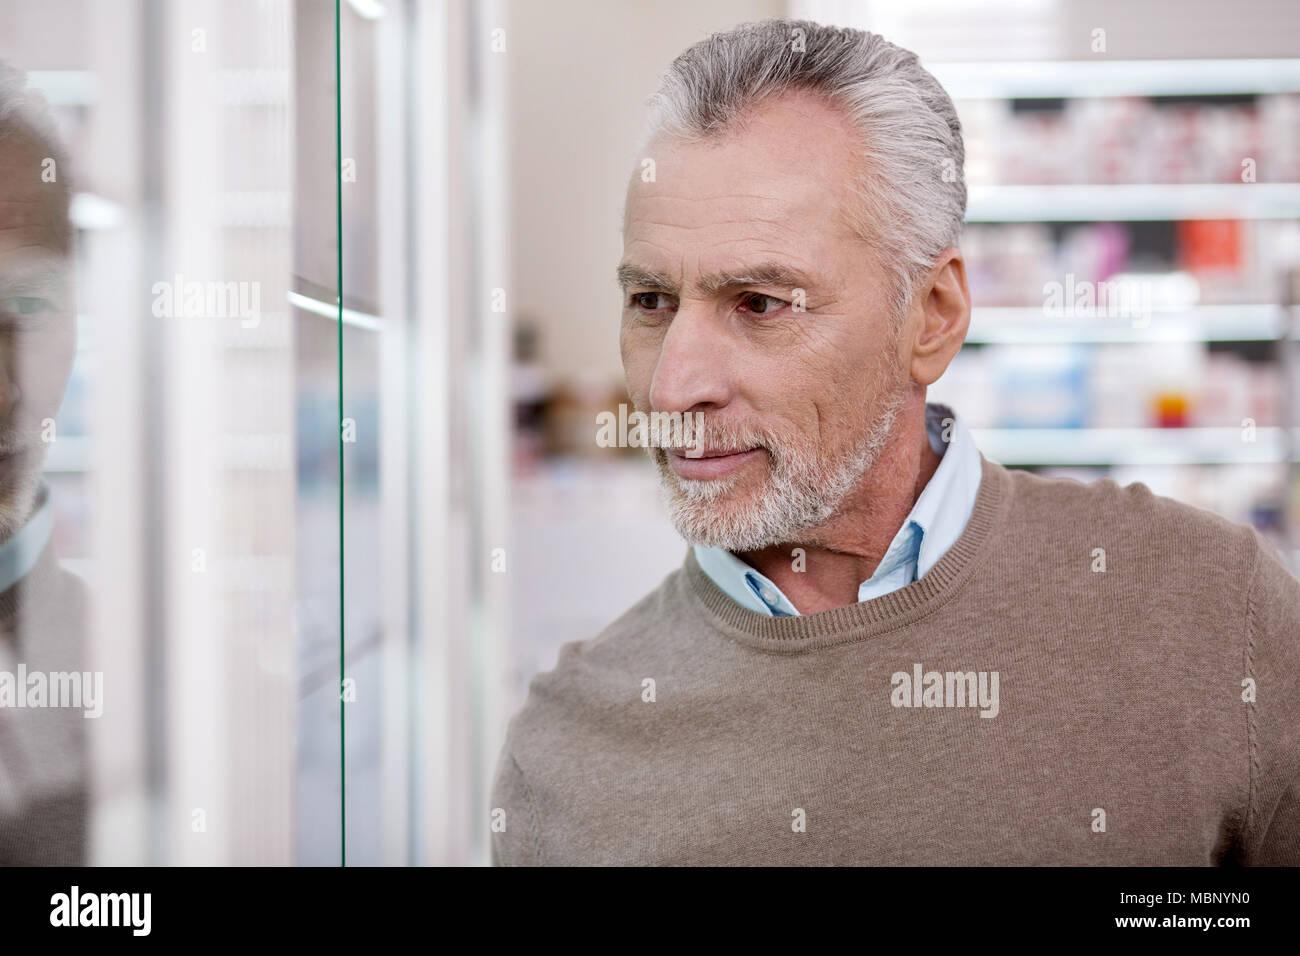 Charming senior man selecting goods - Stock Image